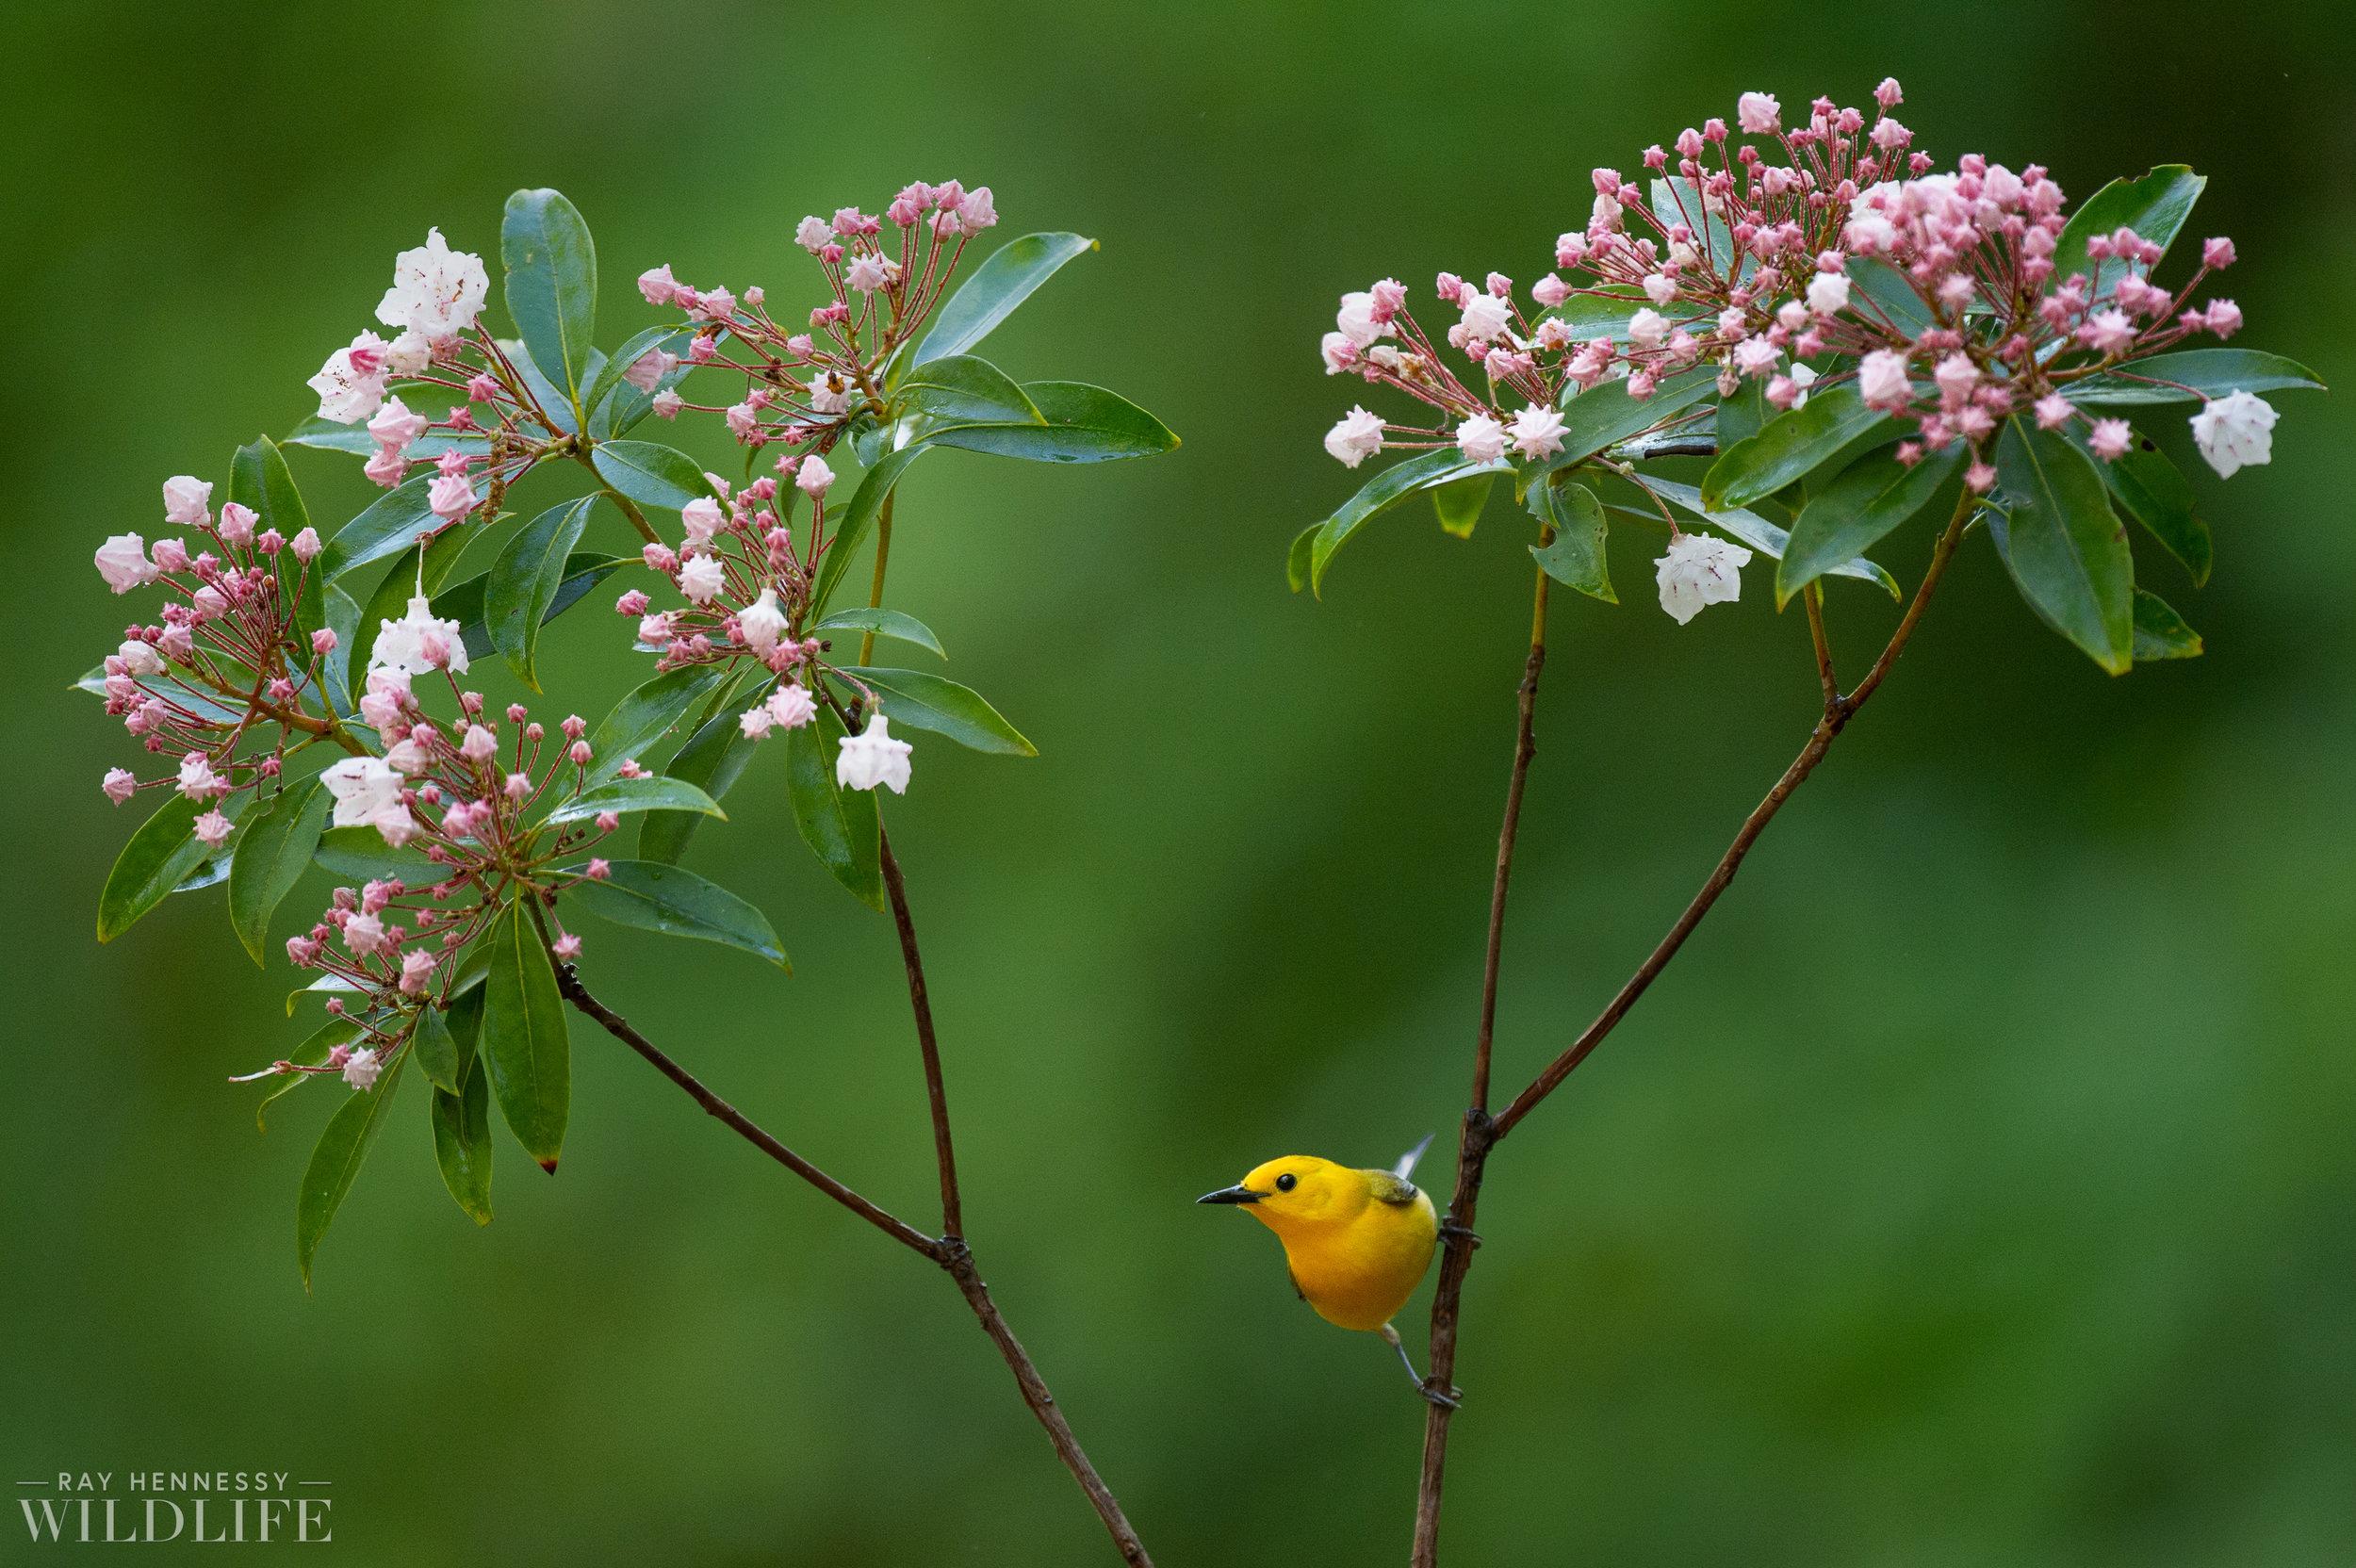 019_shorebirds-prothonotary-warbler.jpg